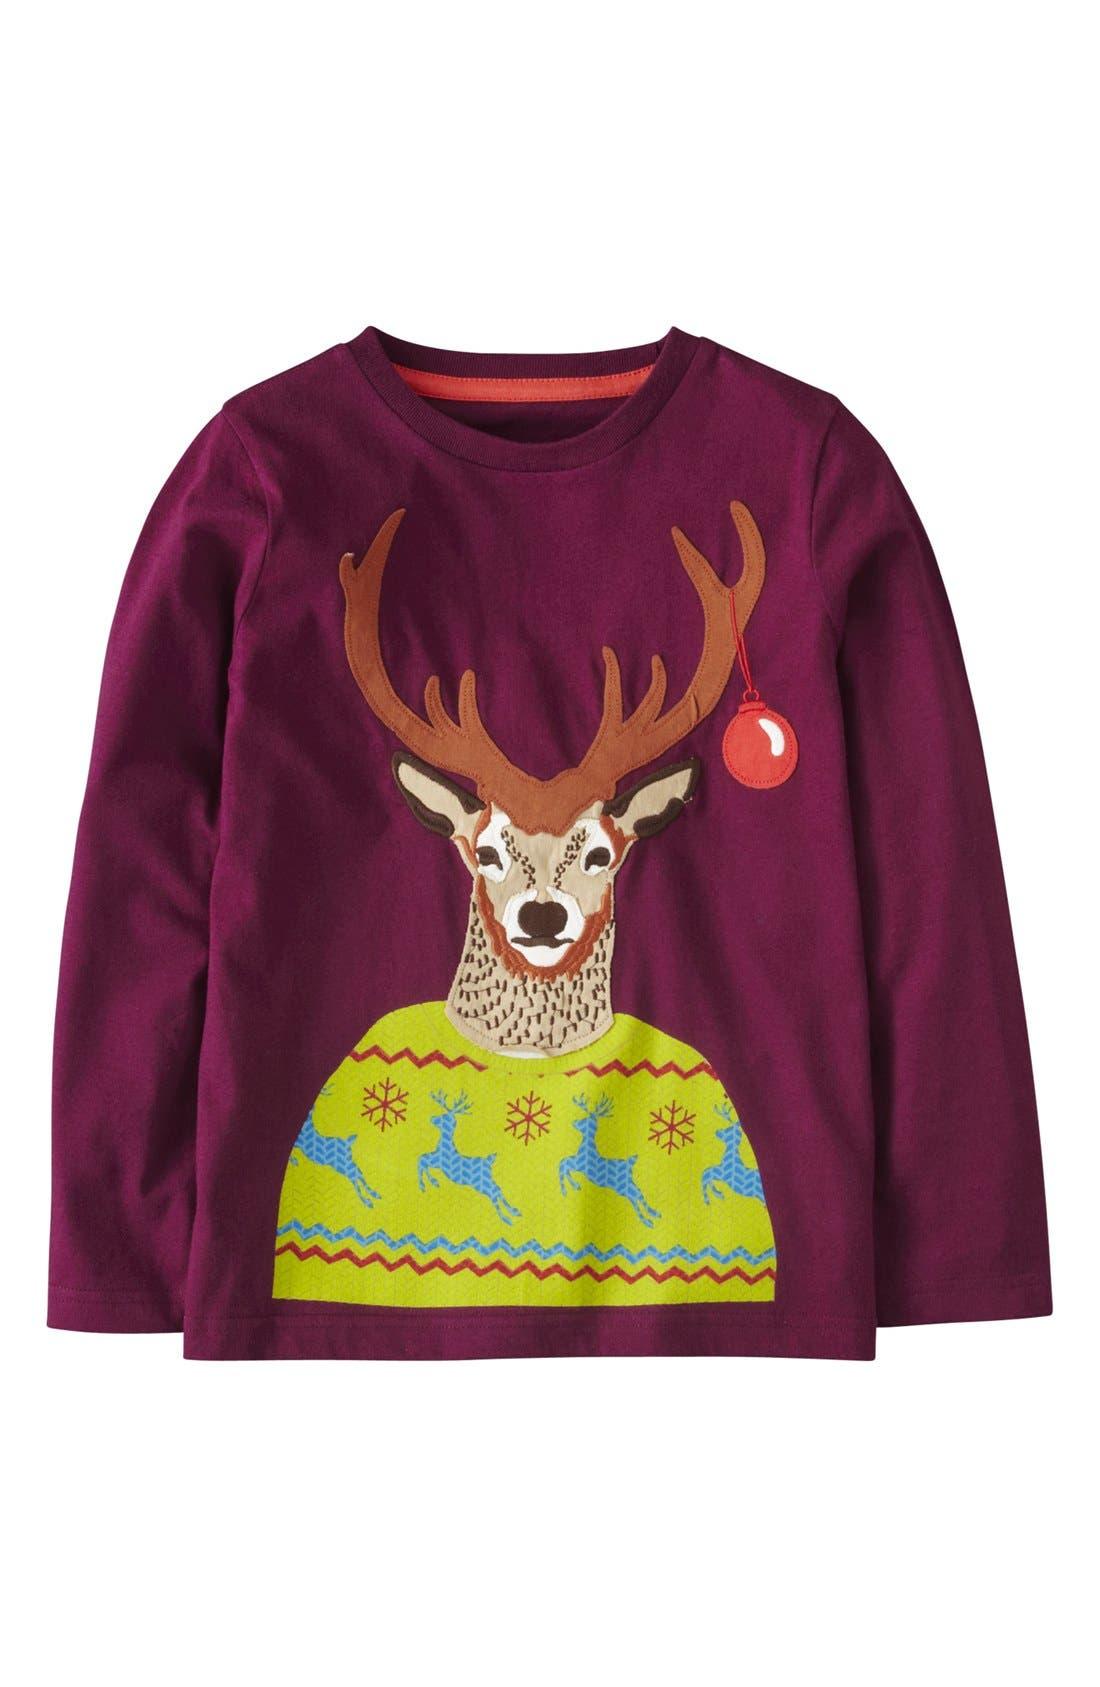 Main Image - Mini Boden 'Winter Fun' Long Sleeve T-Shirt (Toddler Boys, Little Boys & Big Boys)